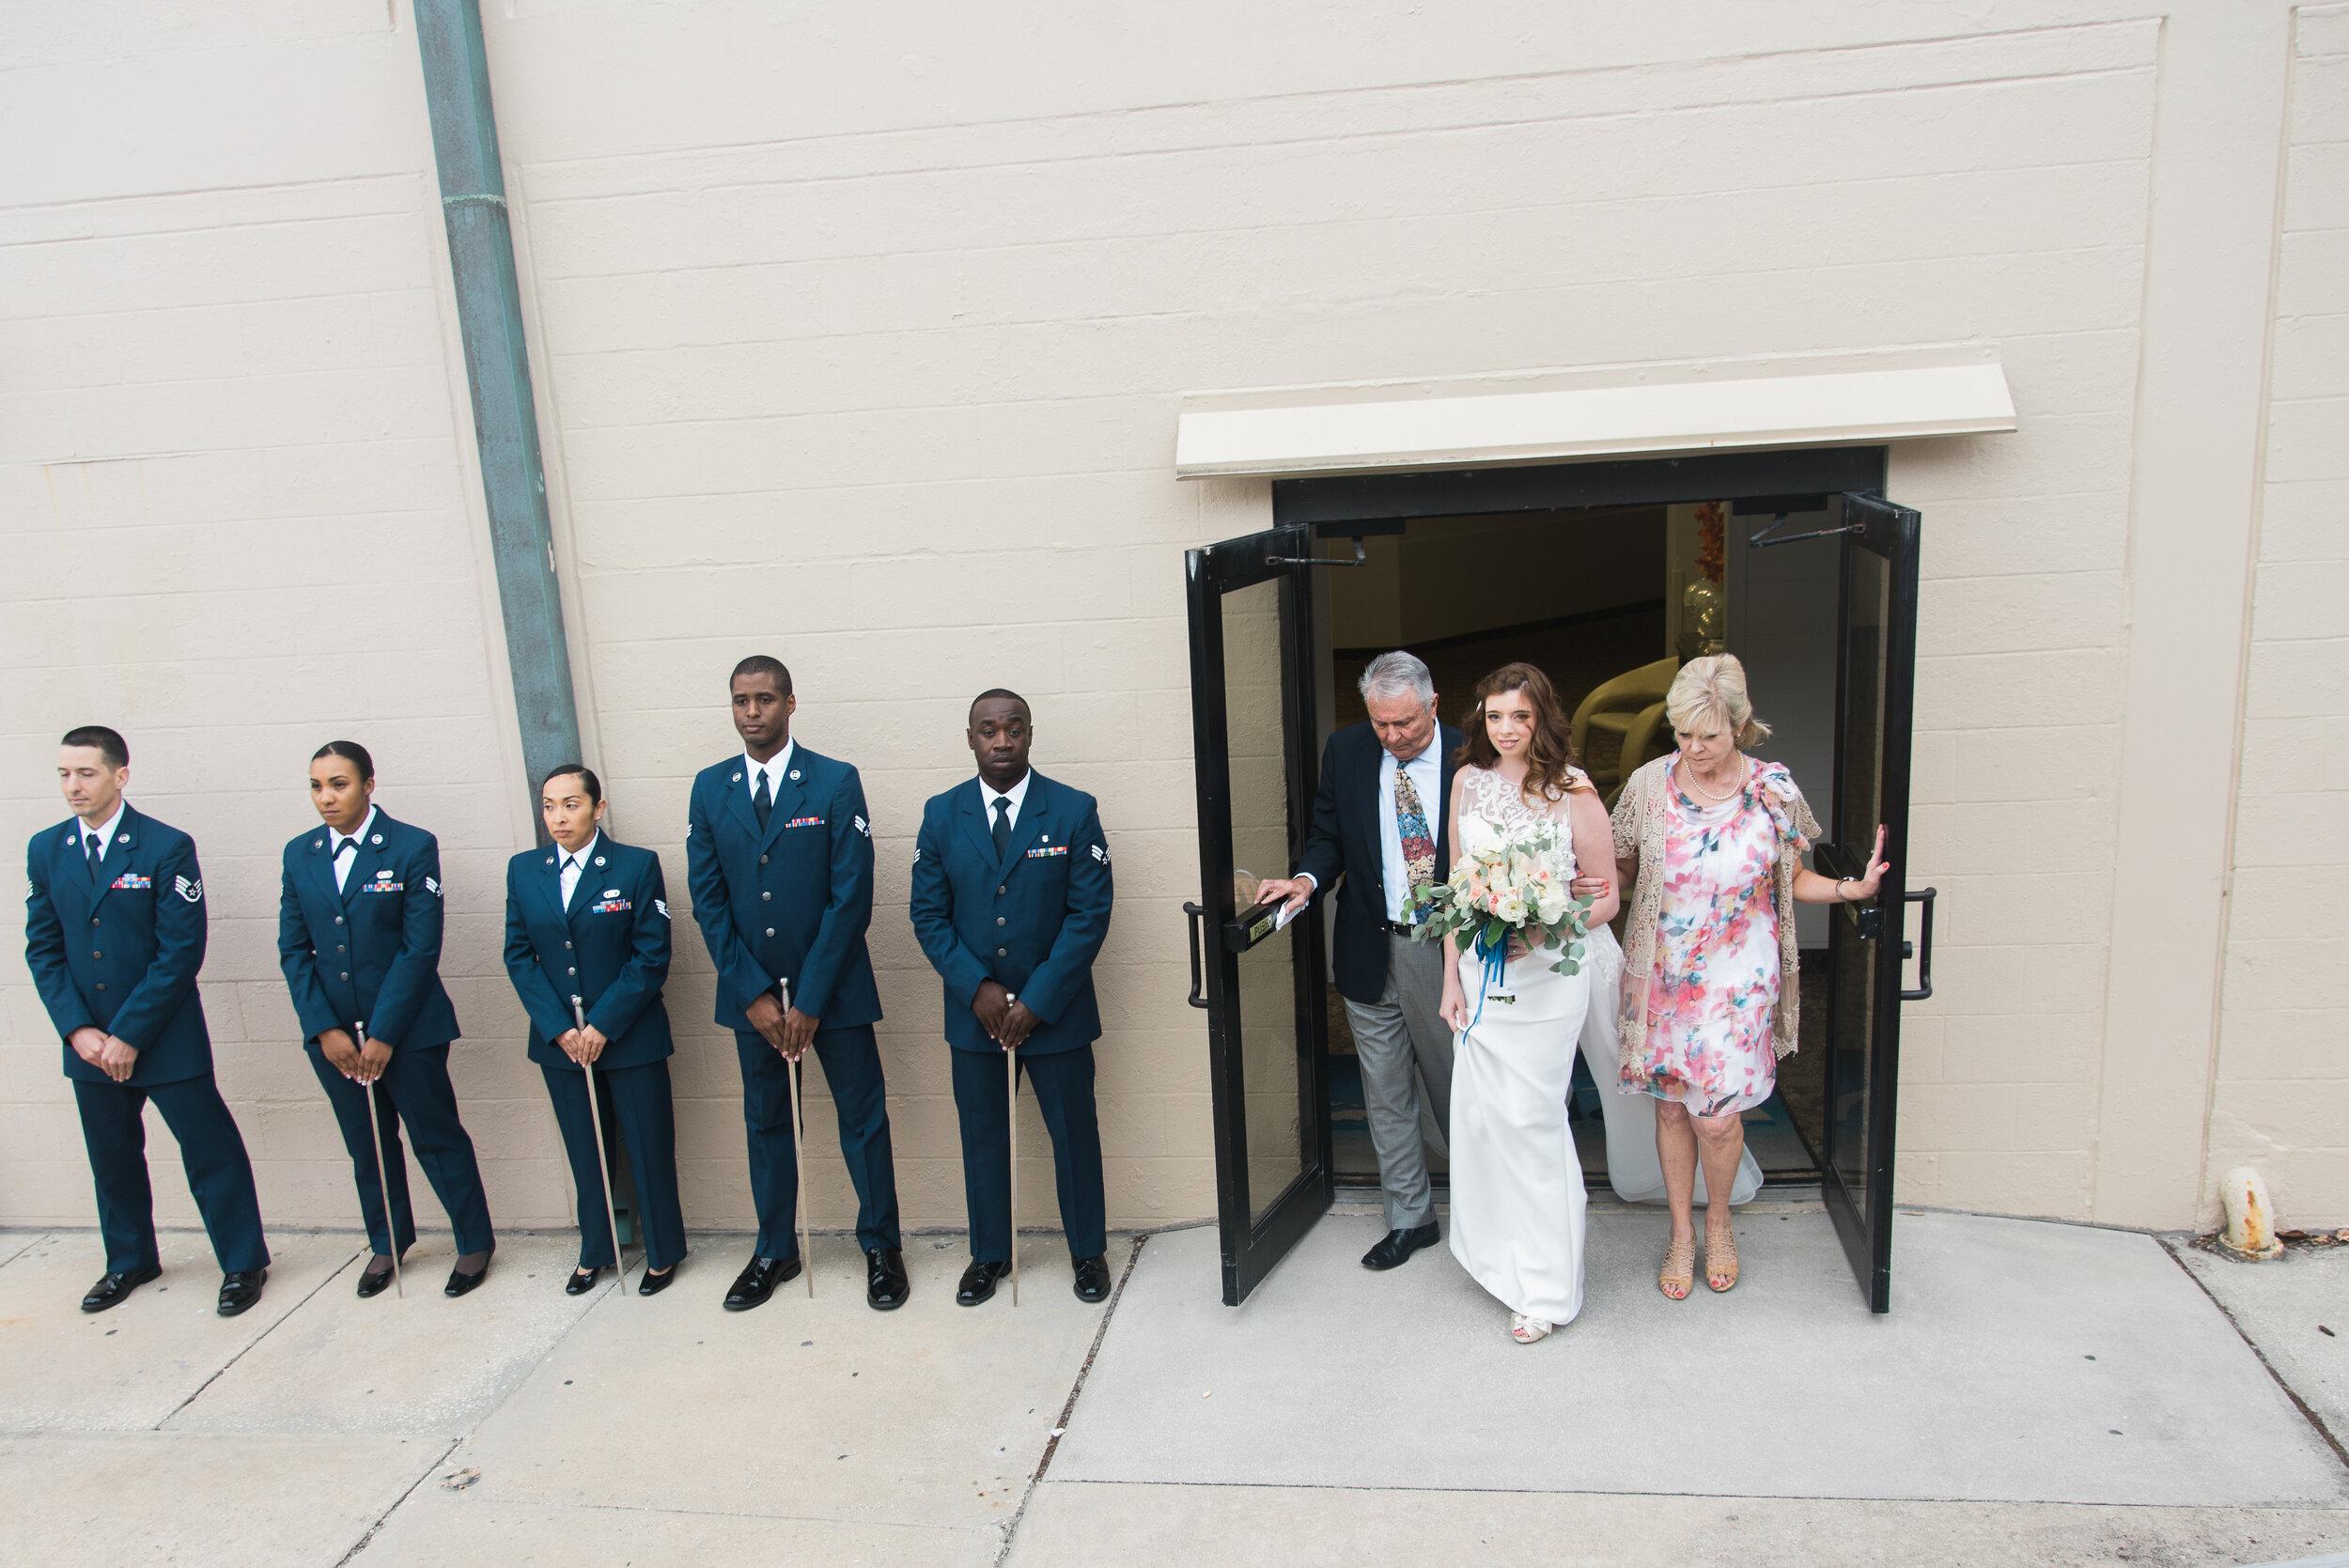 andru-the-tide-club-air-force-wedding-patrickafb-1-30.jpg